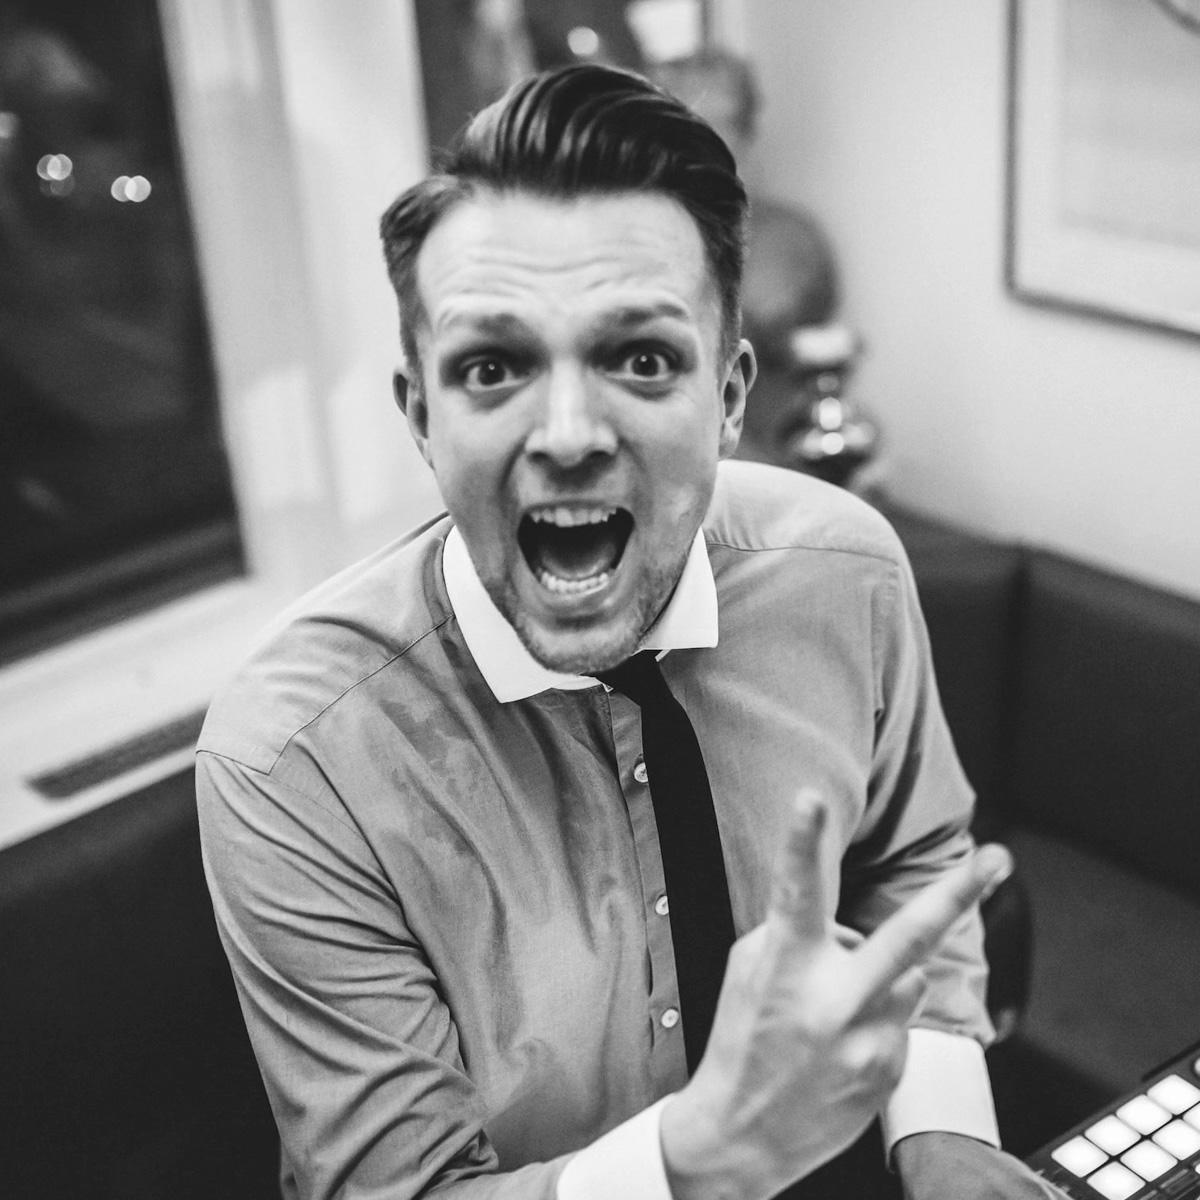 DJ |Hannover |Hochzeit |DJ |Timm |Lehmann |DJ |Firmenfeier |DJ |Geburtstag |DJ |Messeparty |DJ |Betriebsfeier |DJ |Sommerfest |DJ |Gala |Buchen |Mieten |Anfragen |Lehmann |Eventservice